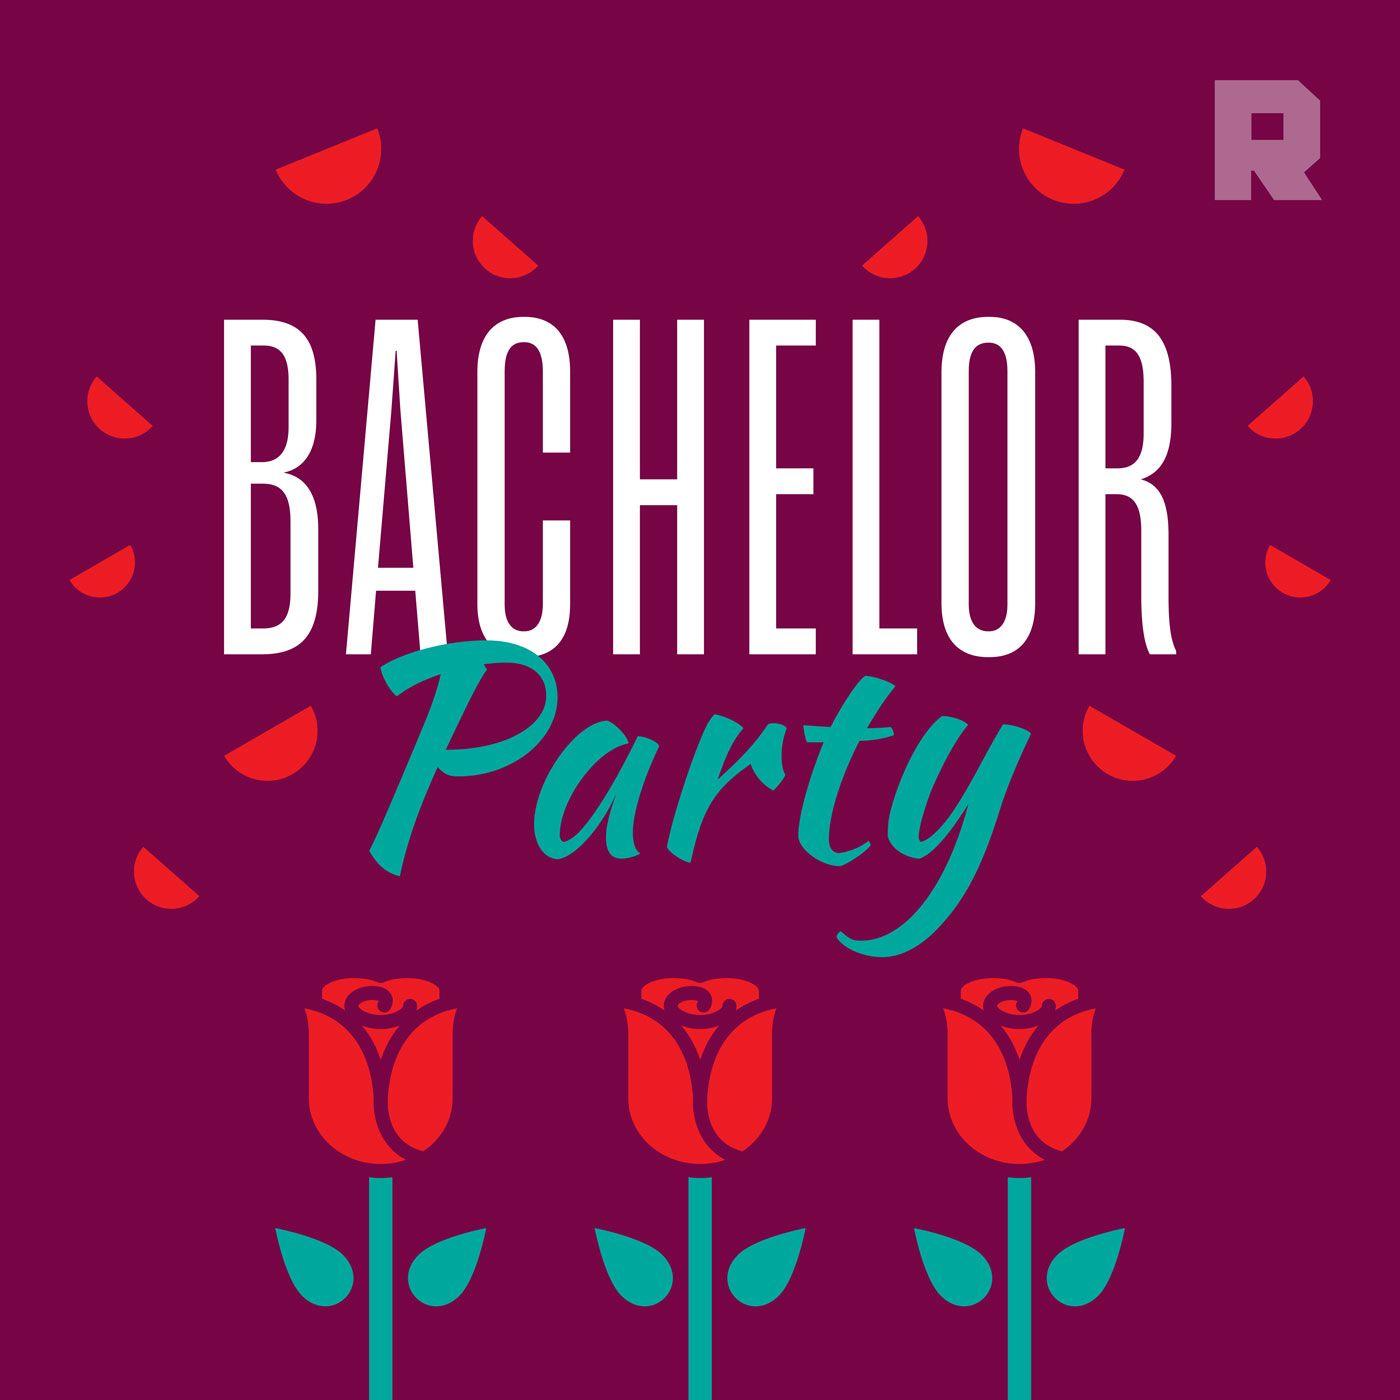 'The Bachelor' Matt James Is Here! Plus, Fan Favorite Ivan Hall.